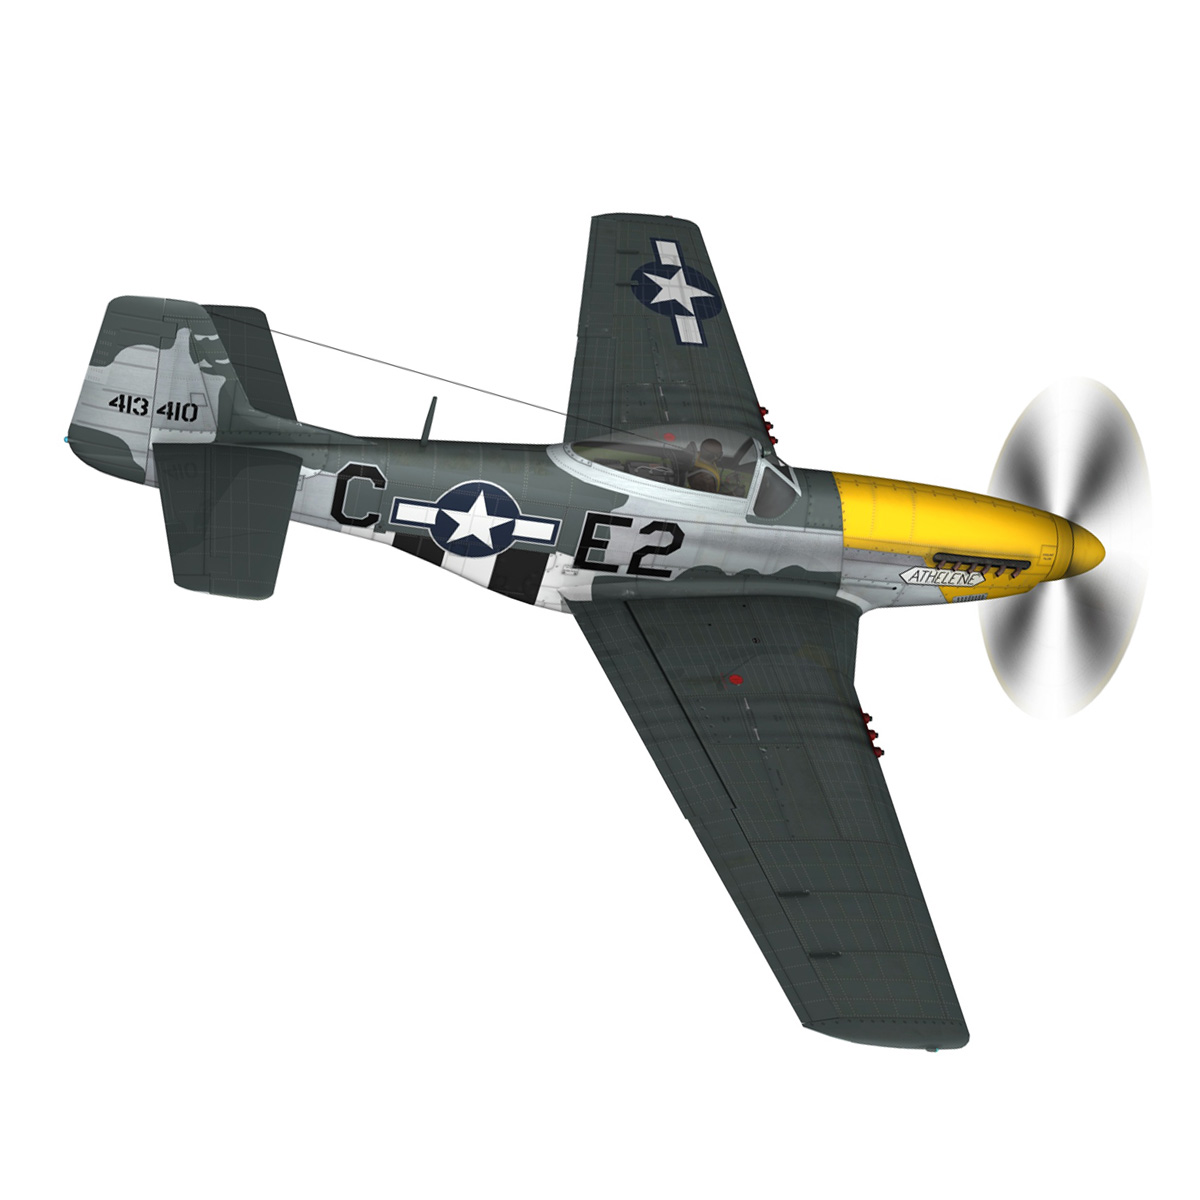 north american p-51d mustang – lou iv 3d model fbx c4d lwo obj 272602